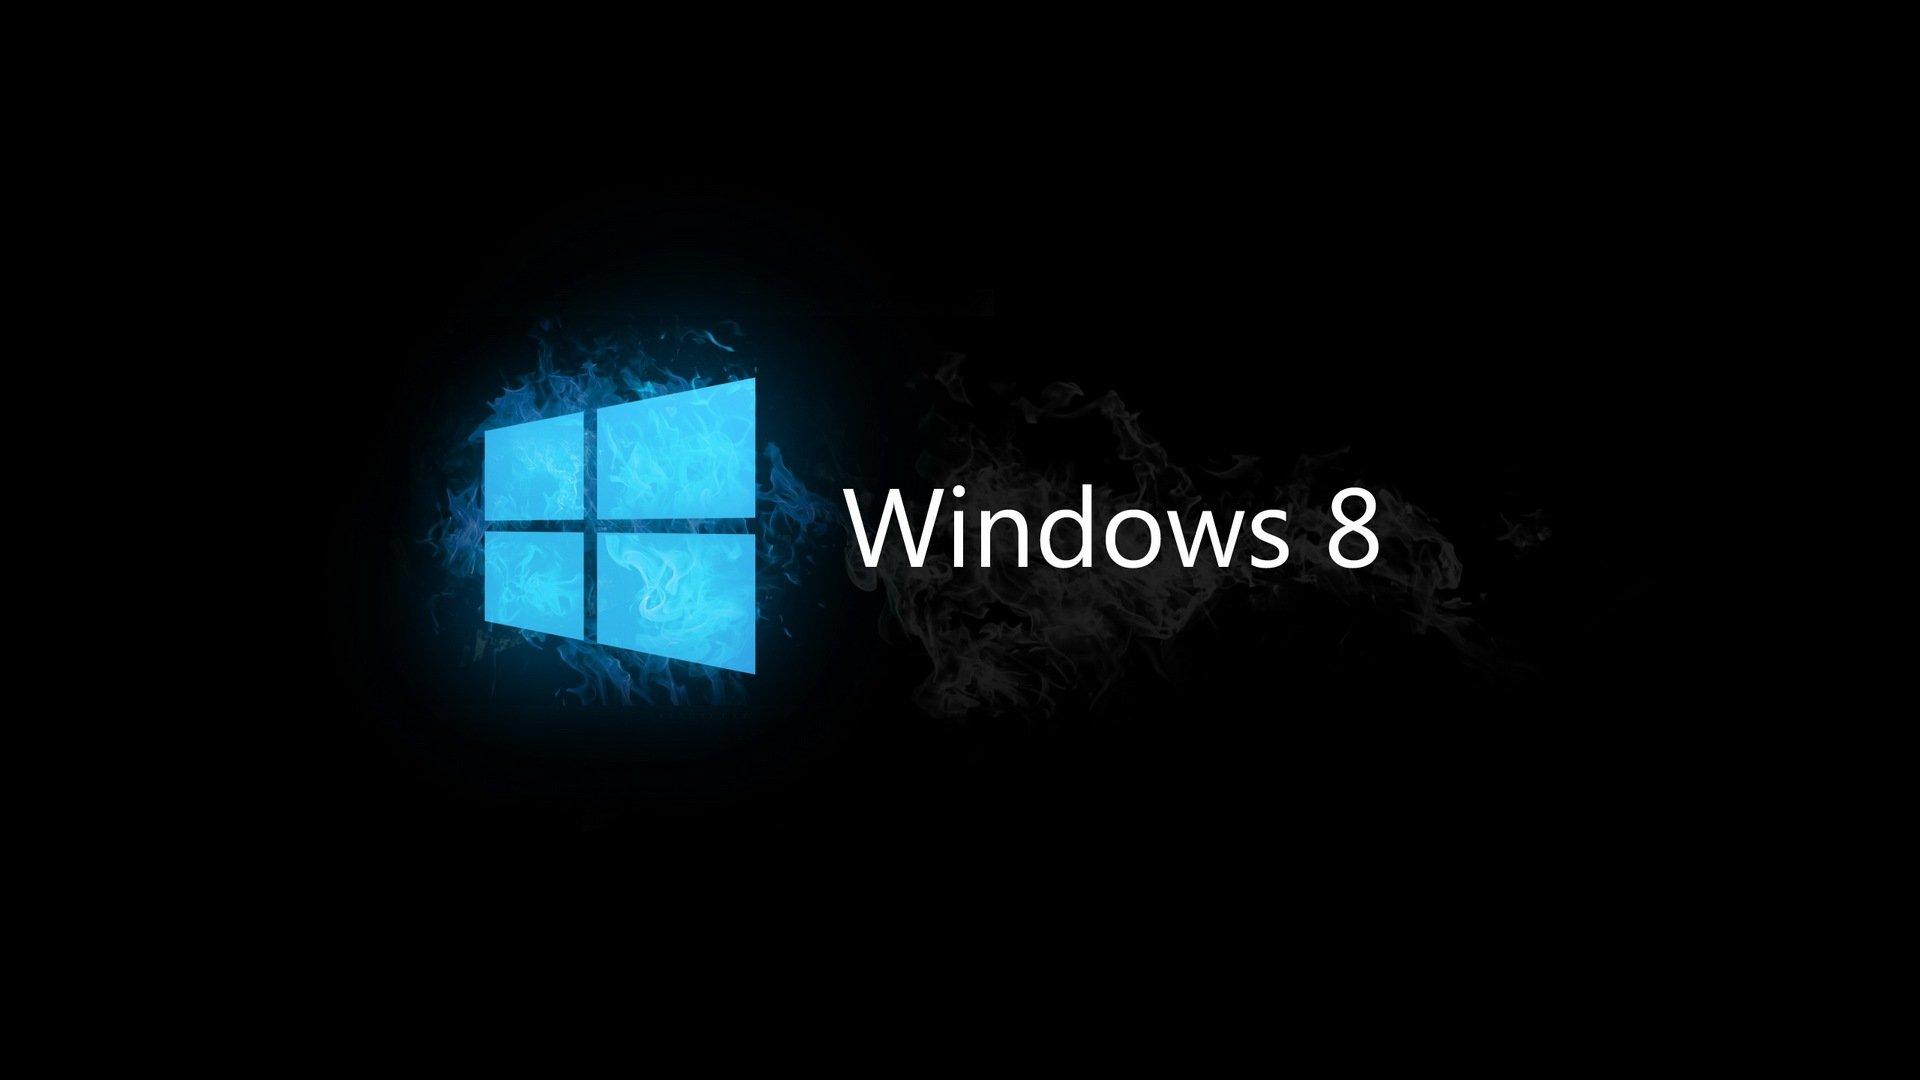 Windows 8 1 hd wallpapers 1920x1080 wallpapersafari - Windows 8 1 wallpaper hd nature ...